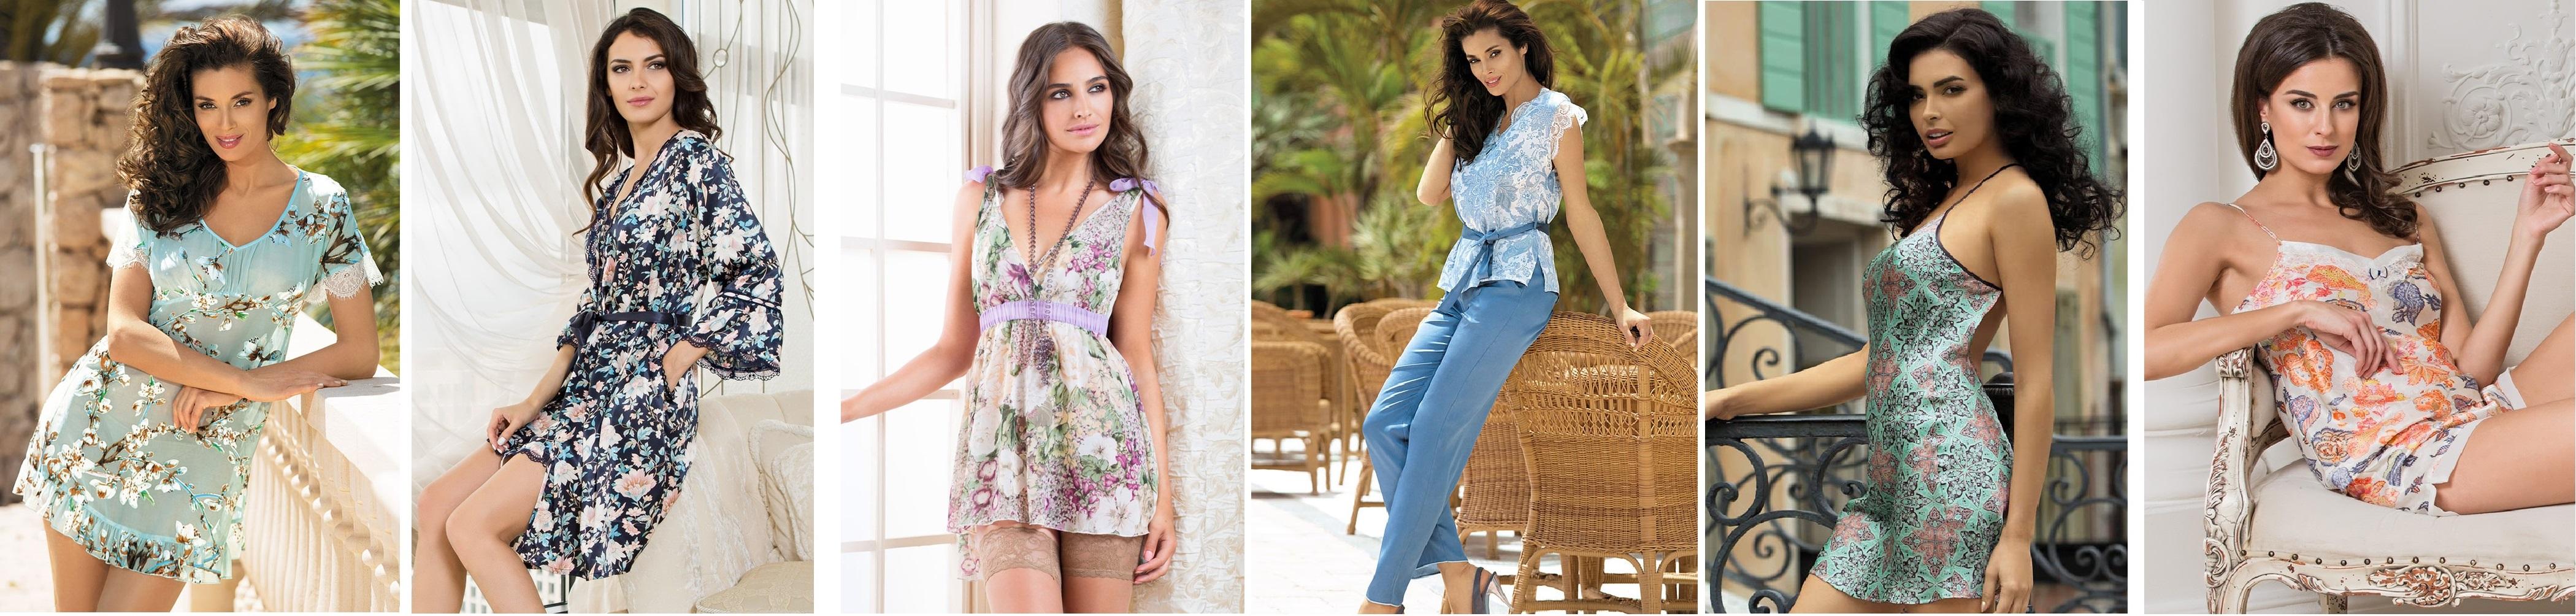 Женские сорочки, пижамы, халаты, комплекты шелк Mia-Mia купить интернет-магазин